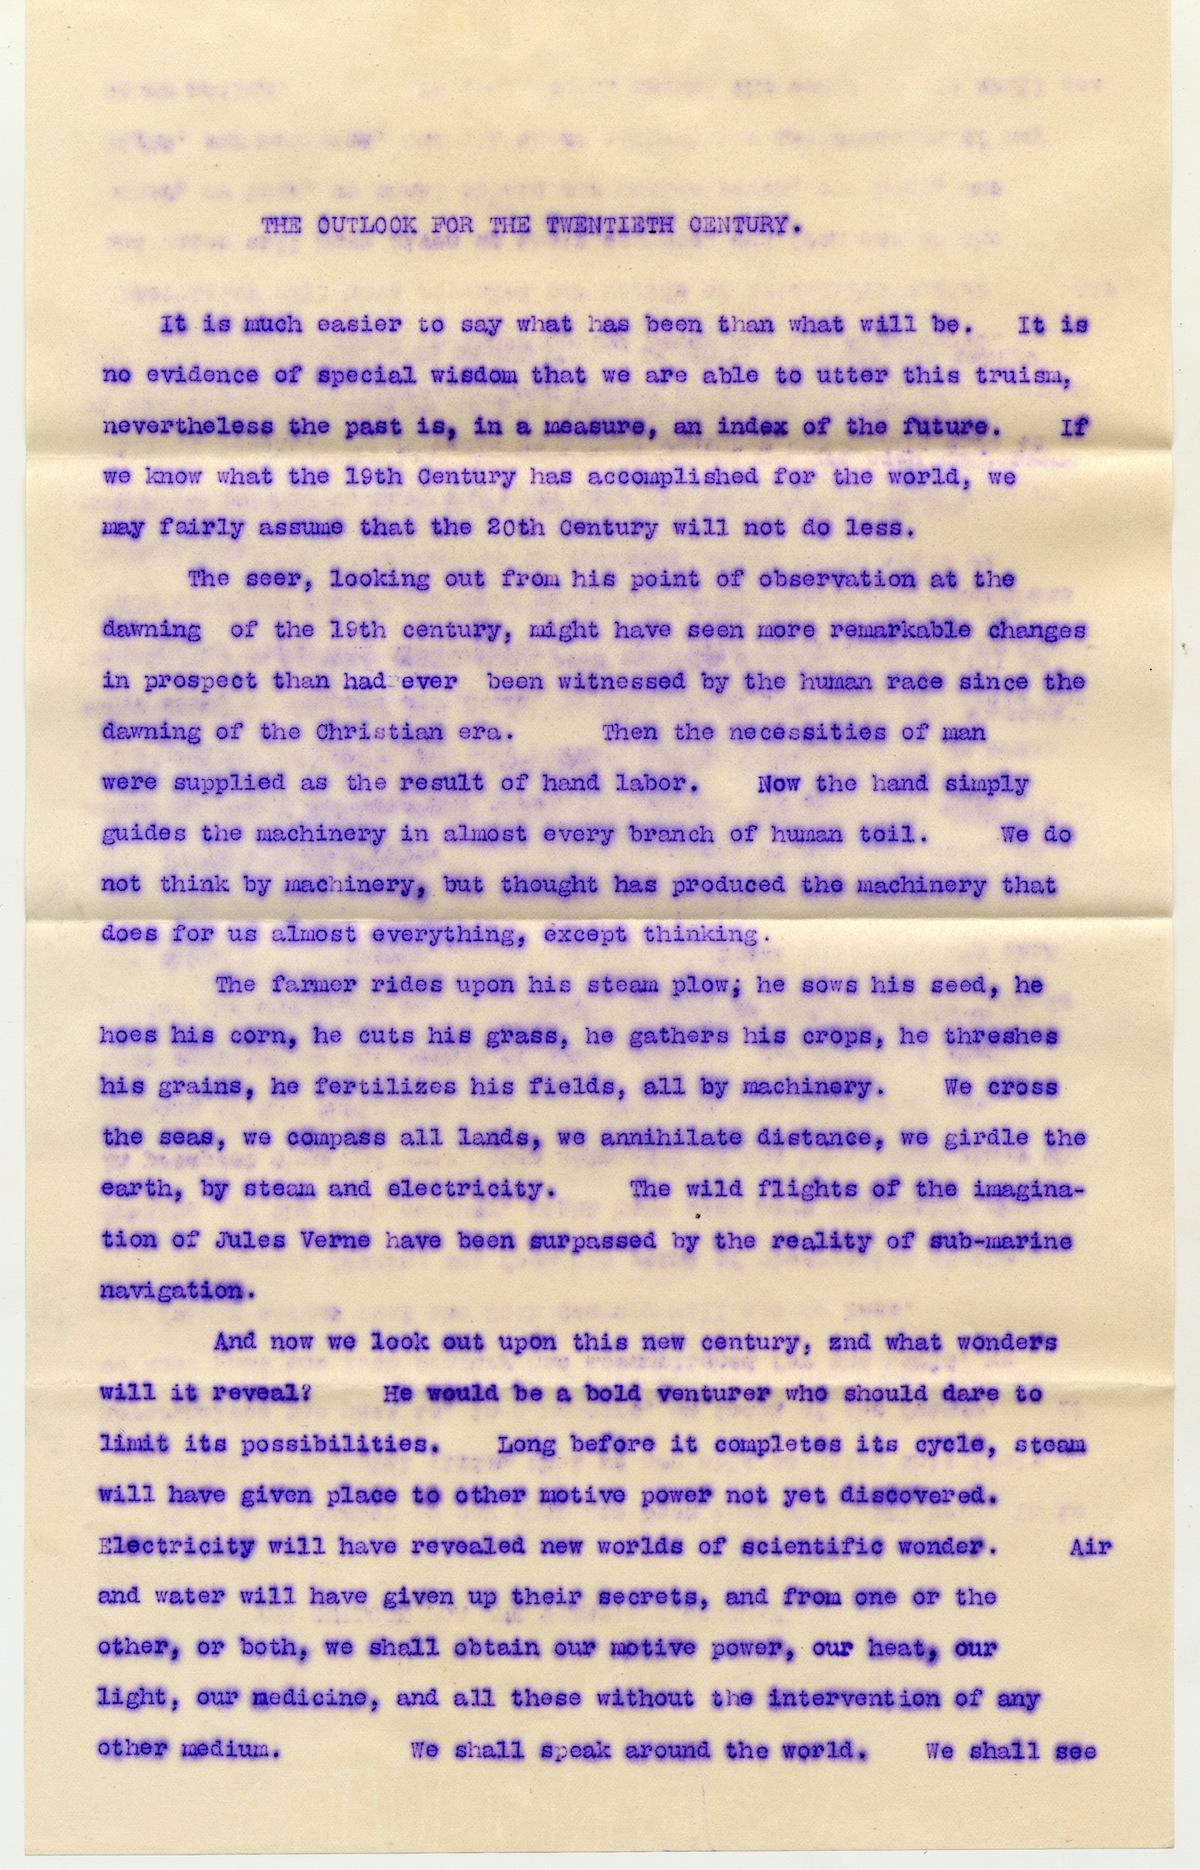 Boston Traveler letter page 1